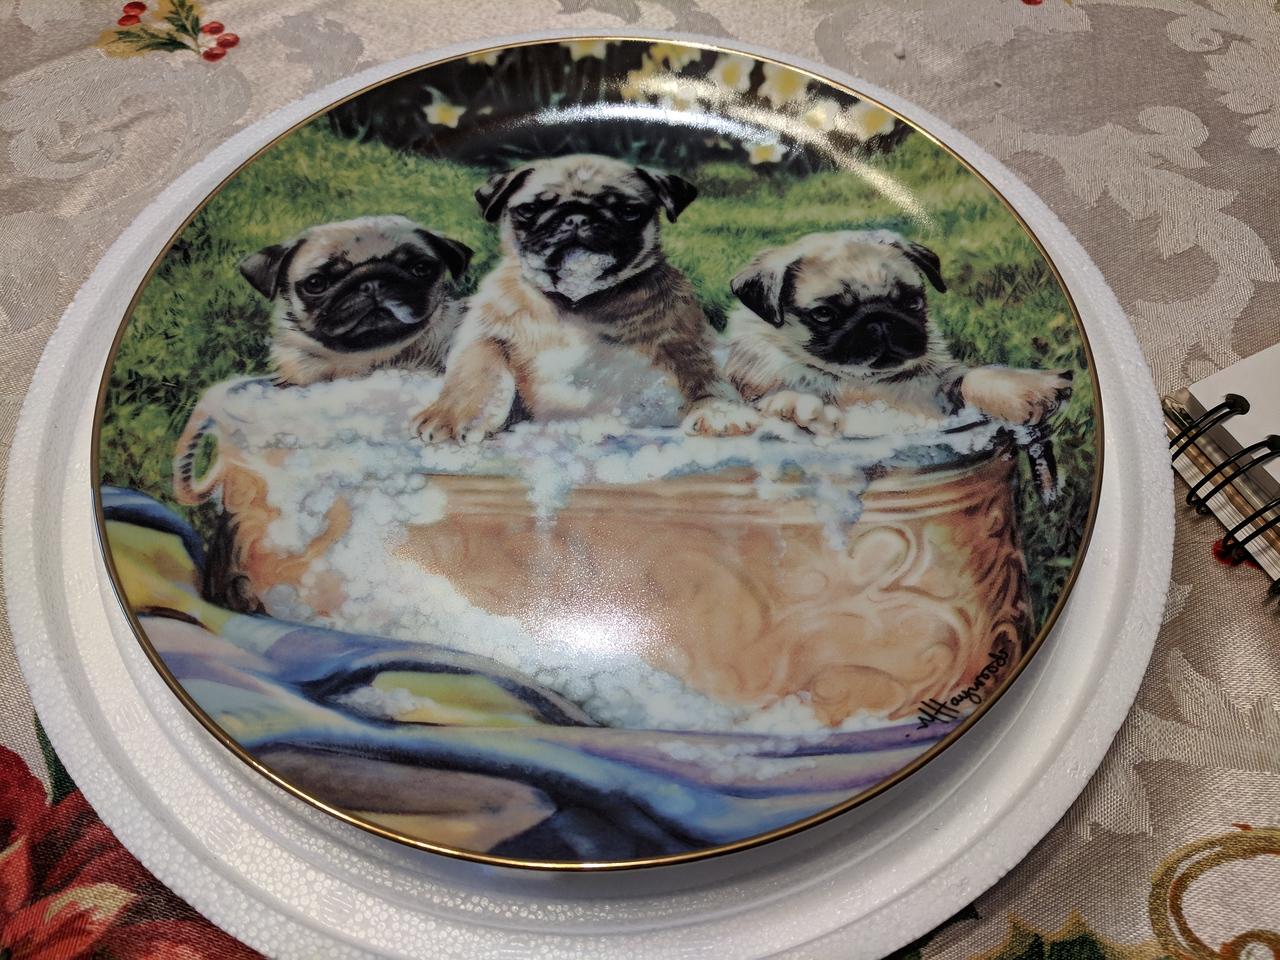 Danbury Mint Bathtime Buddies